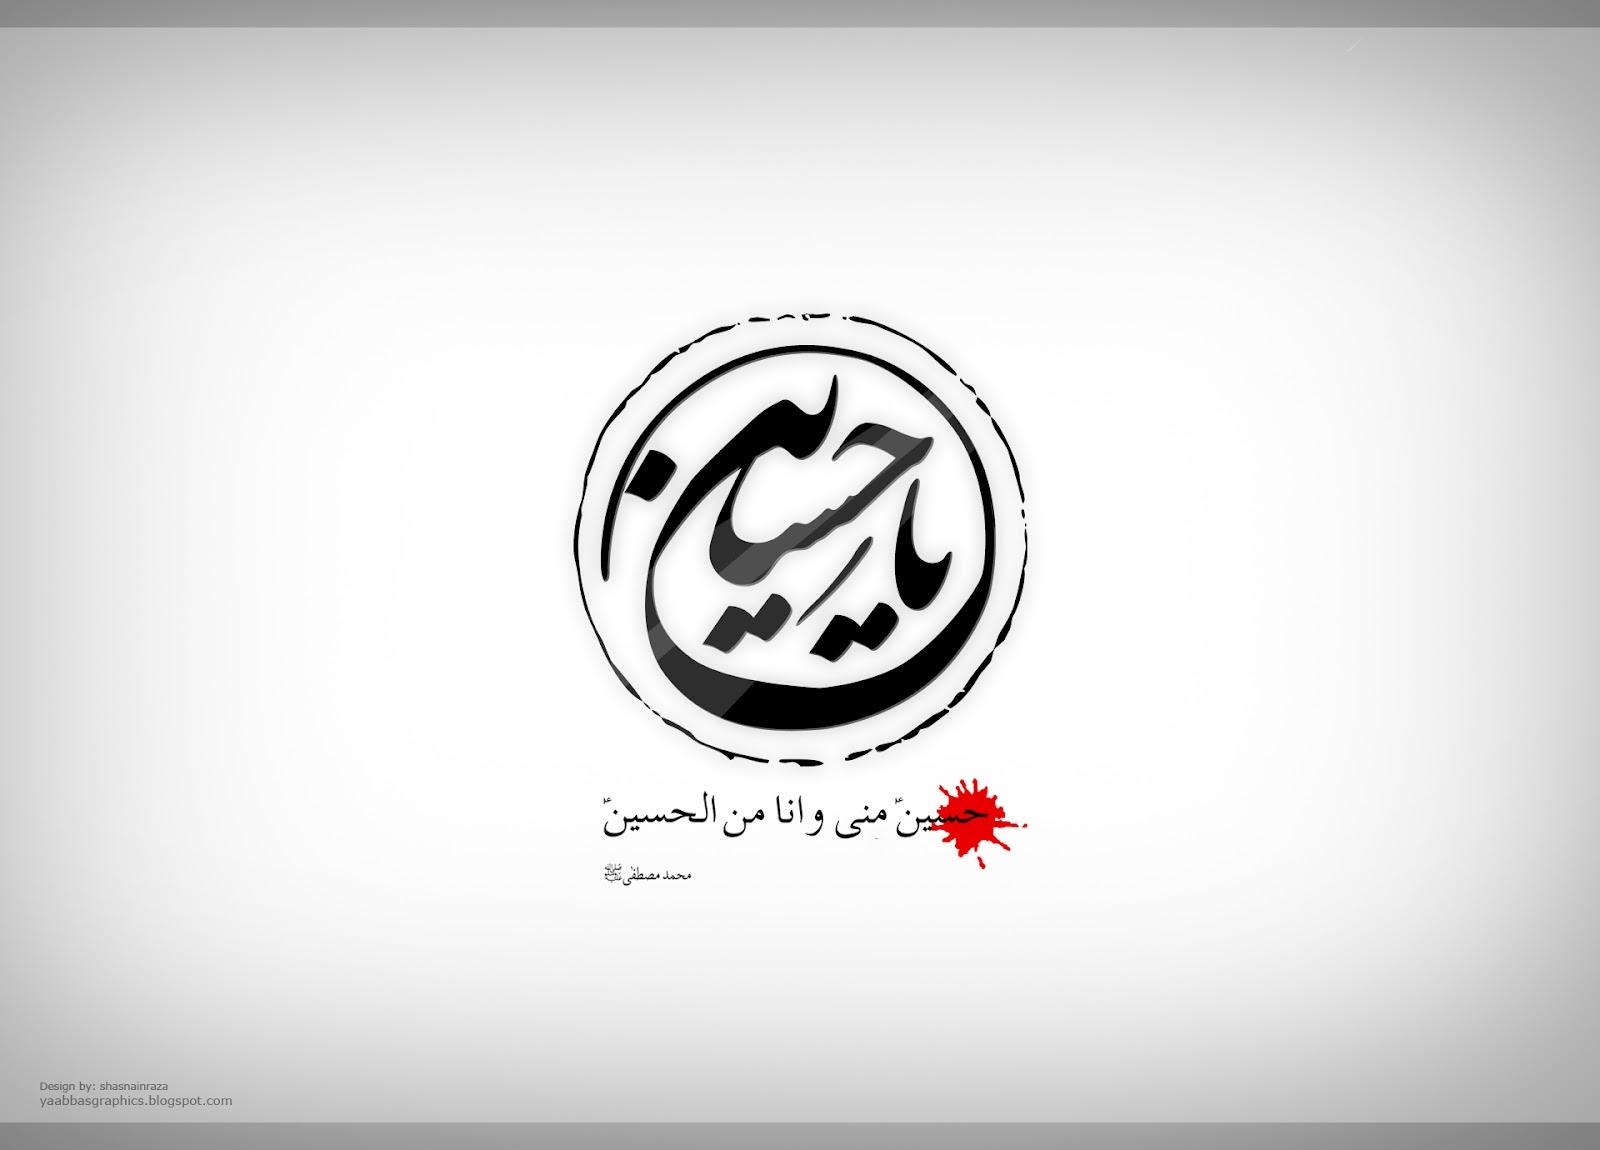 Ya Hussain Calligraphy Old Style Calligraphy ...